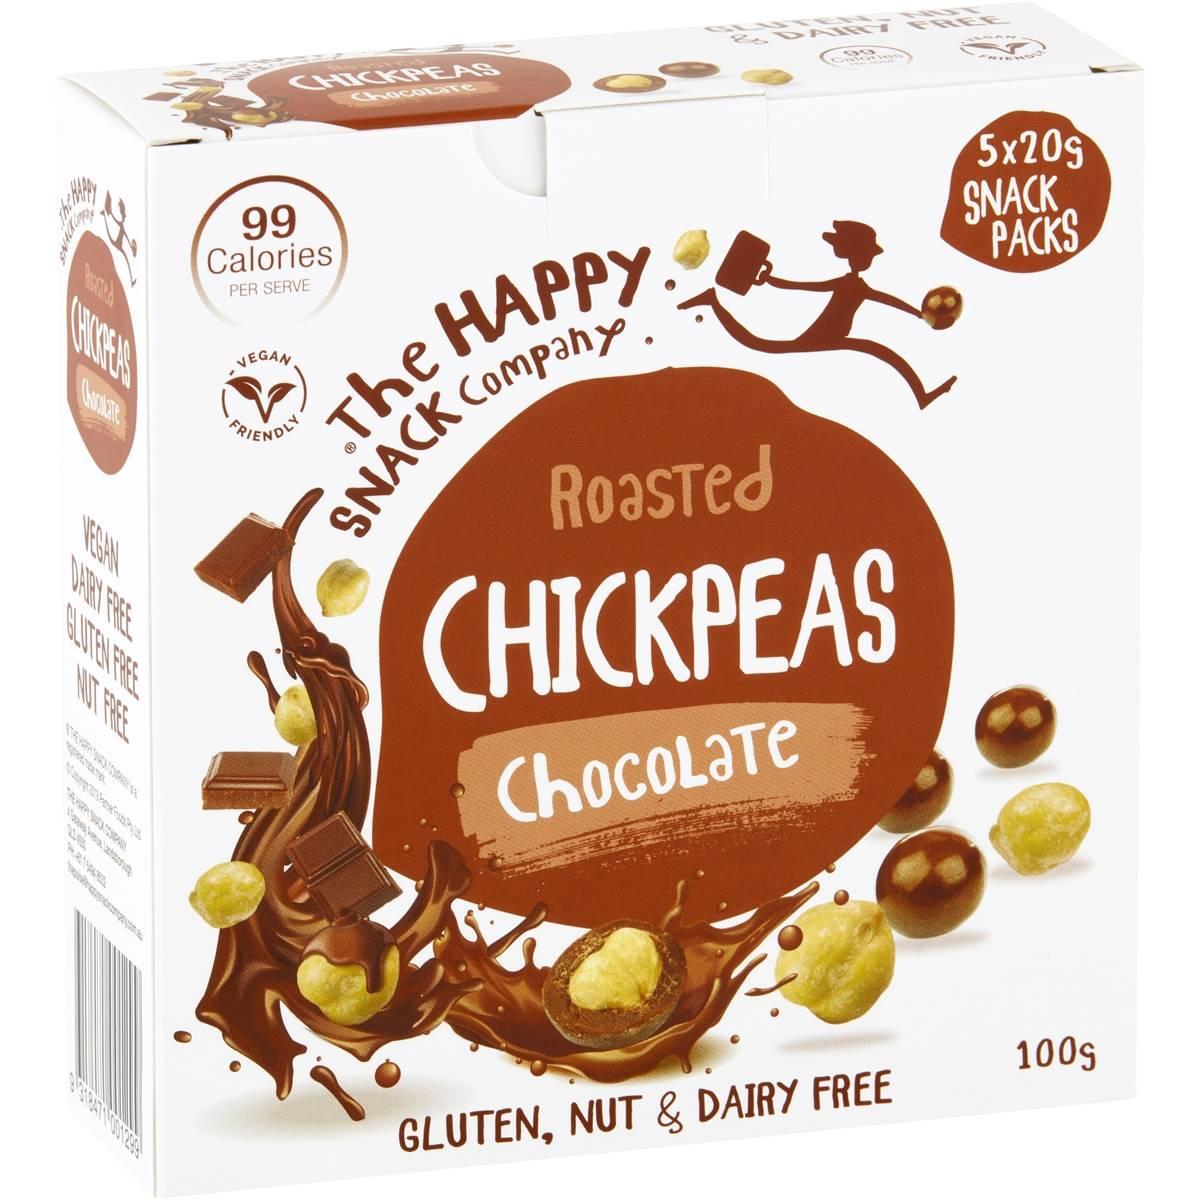 The Happy Snack Company Chickpeas Chocolate